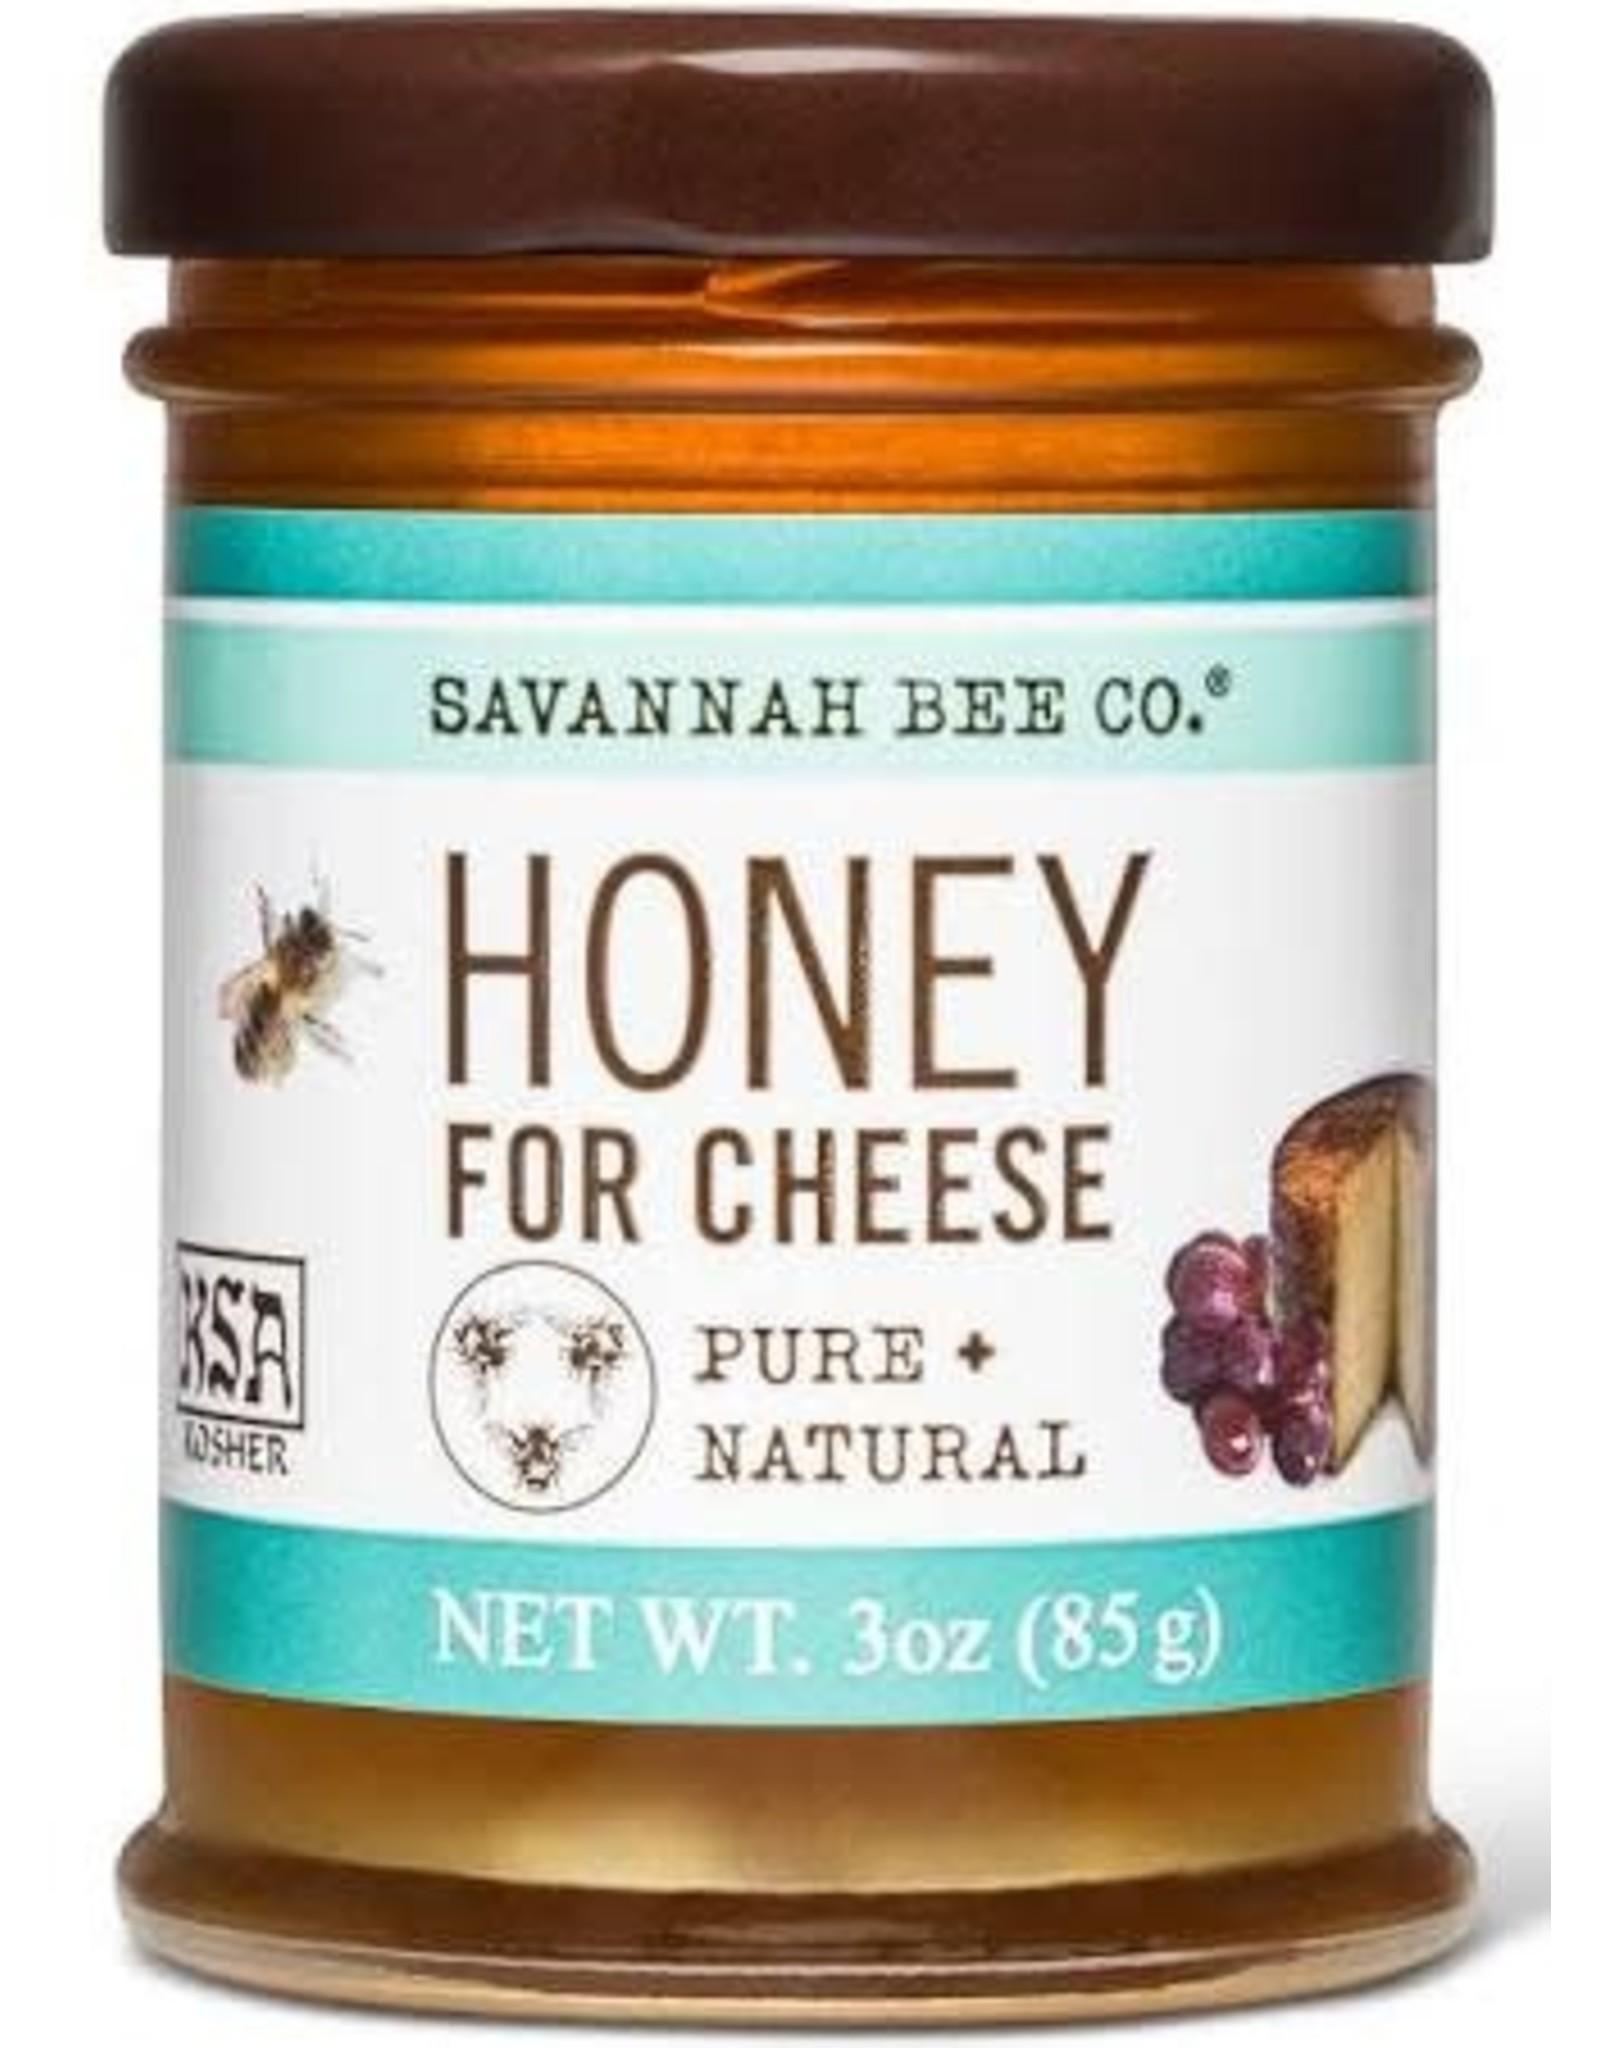 Savannah Bee Honey for Cheese 3oz